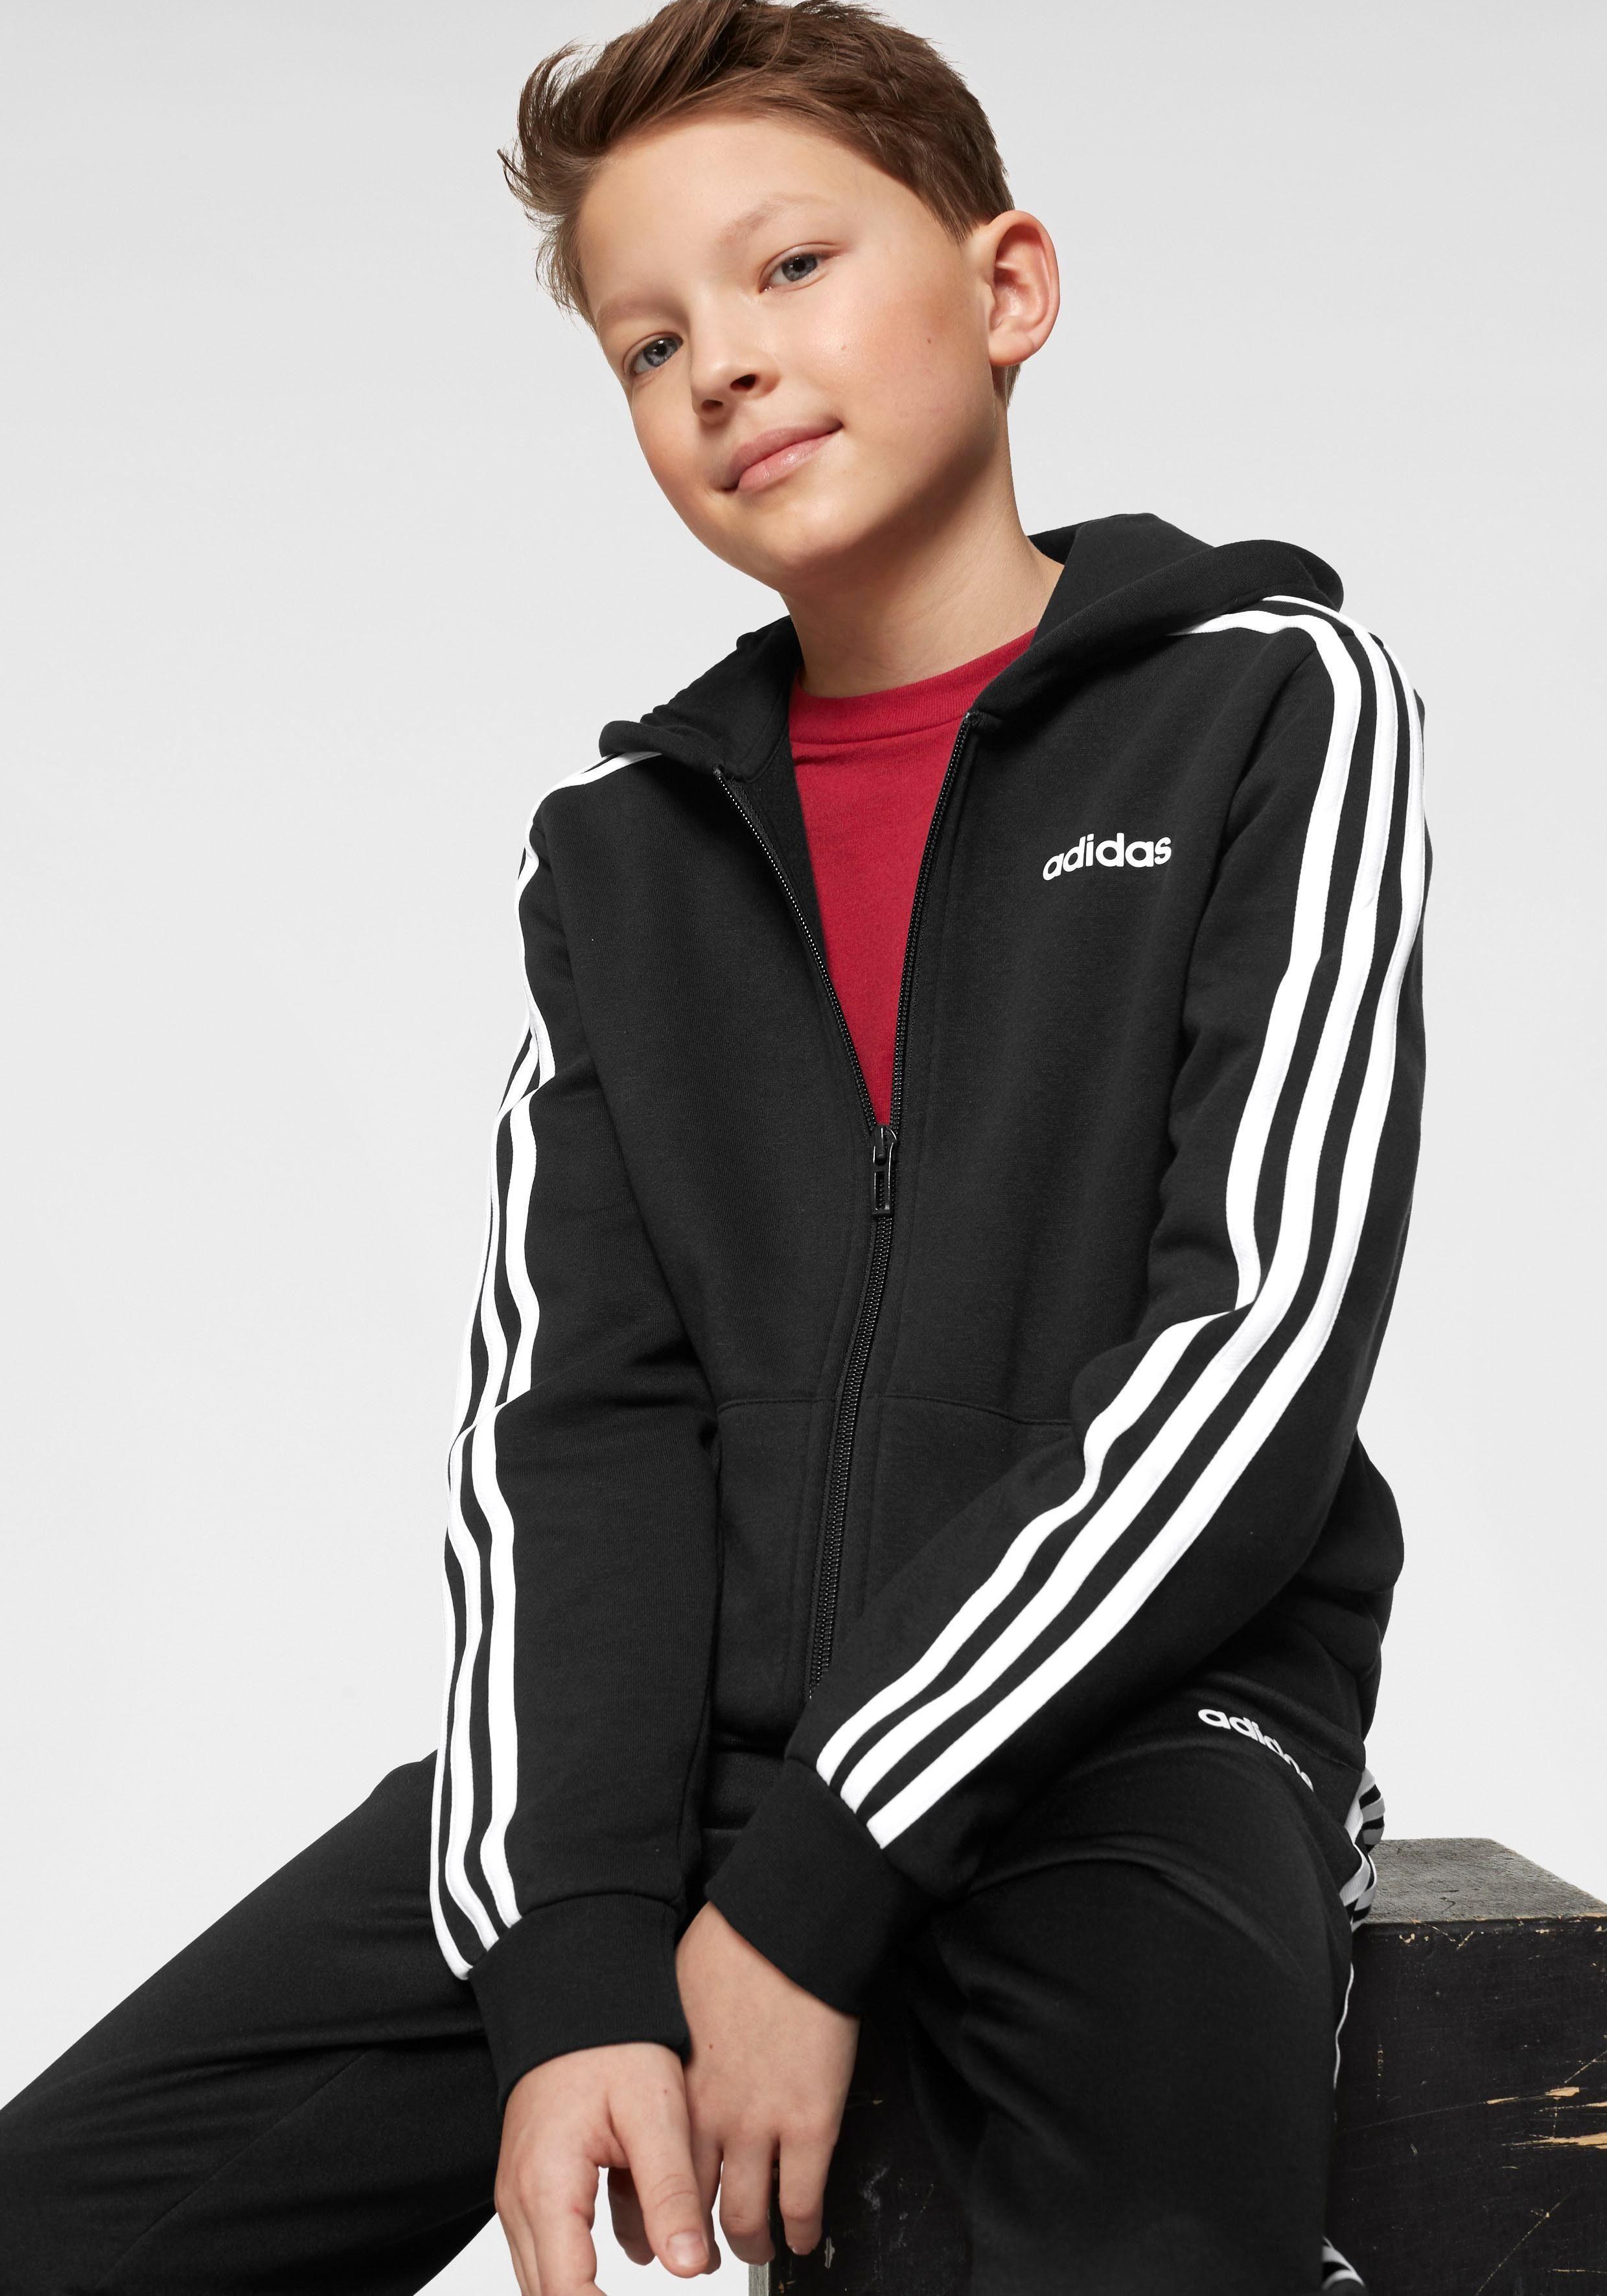 KaufenOtto Boy Stripes Essential 3 »young Hoody« Fullzip Kapuzensweatjacke Online Adidas IYfvbym76g